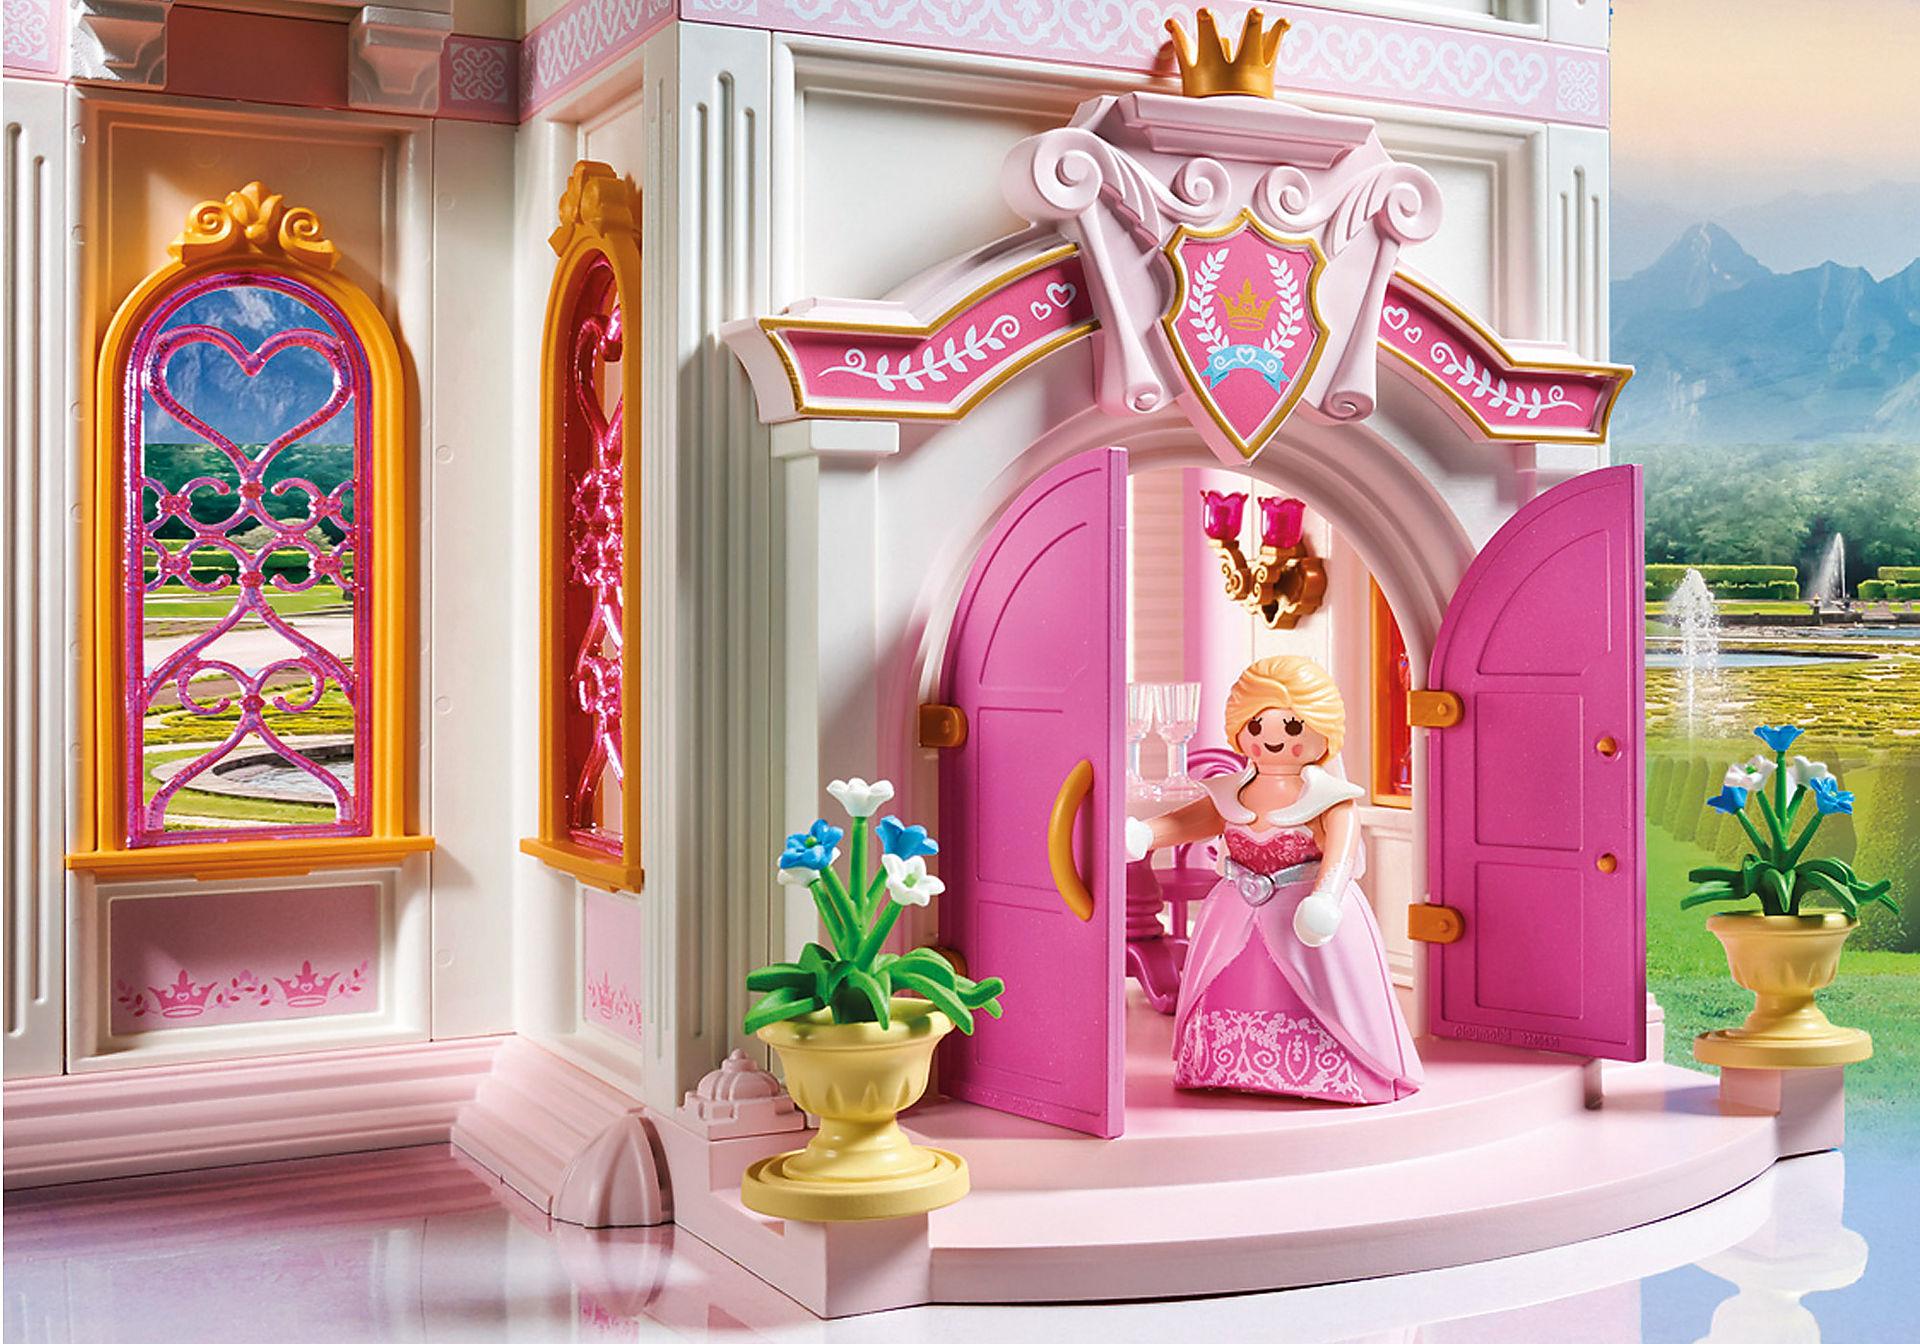 70447 Large Princess Castle zoom image6